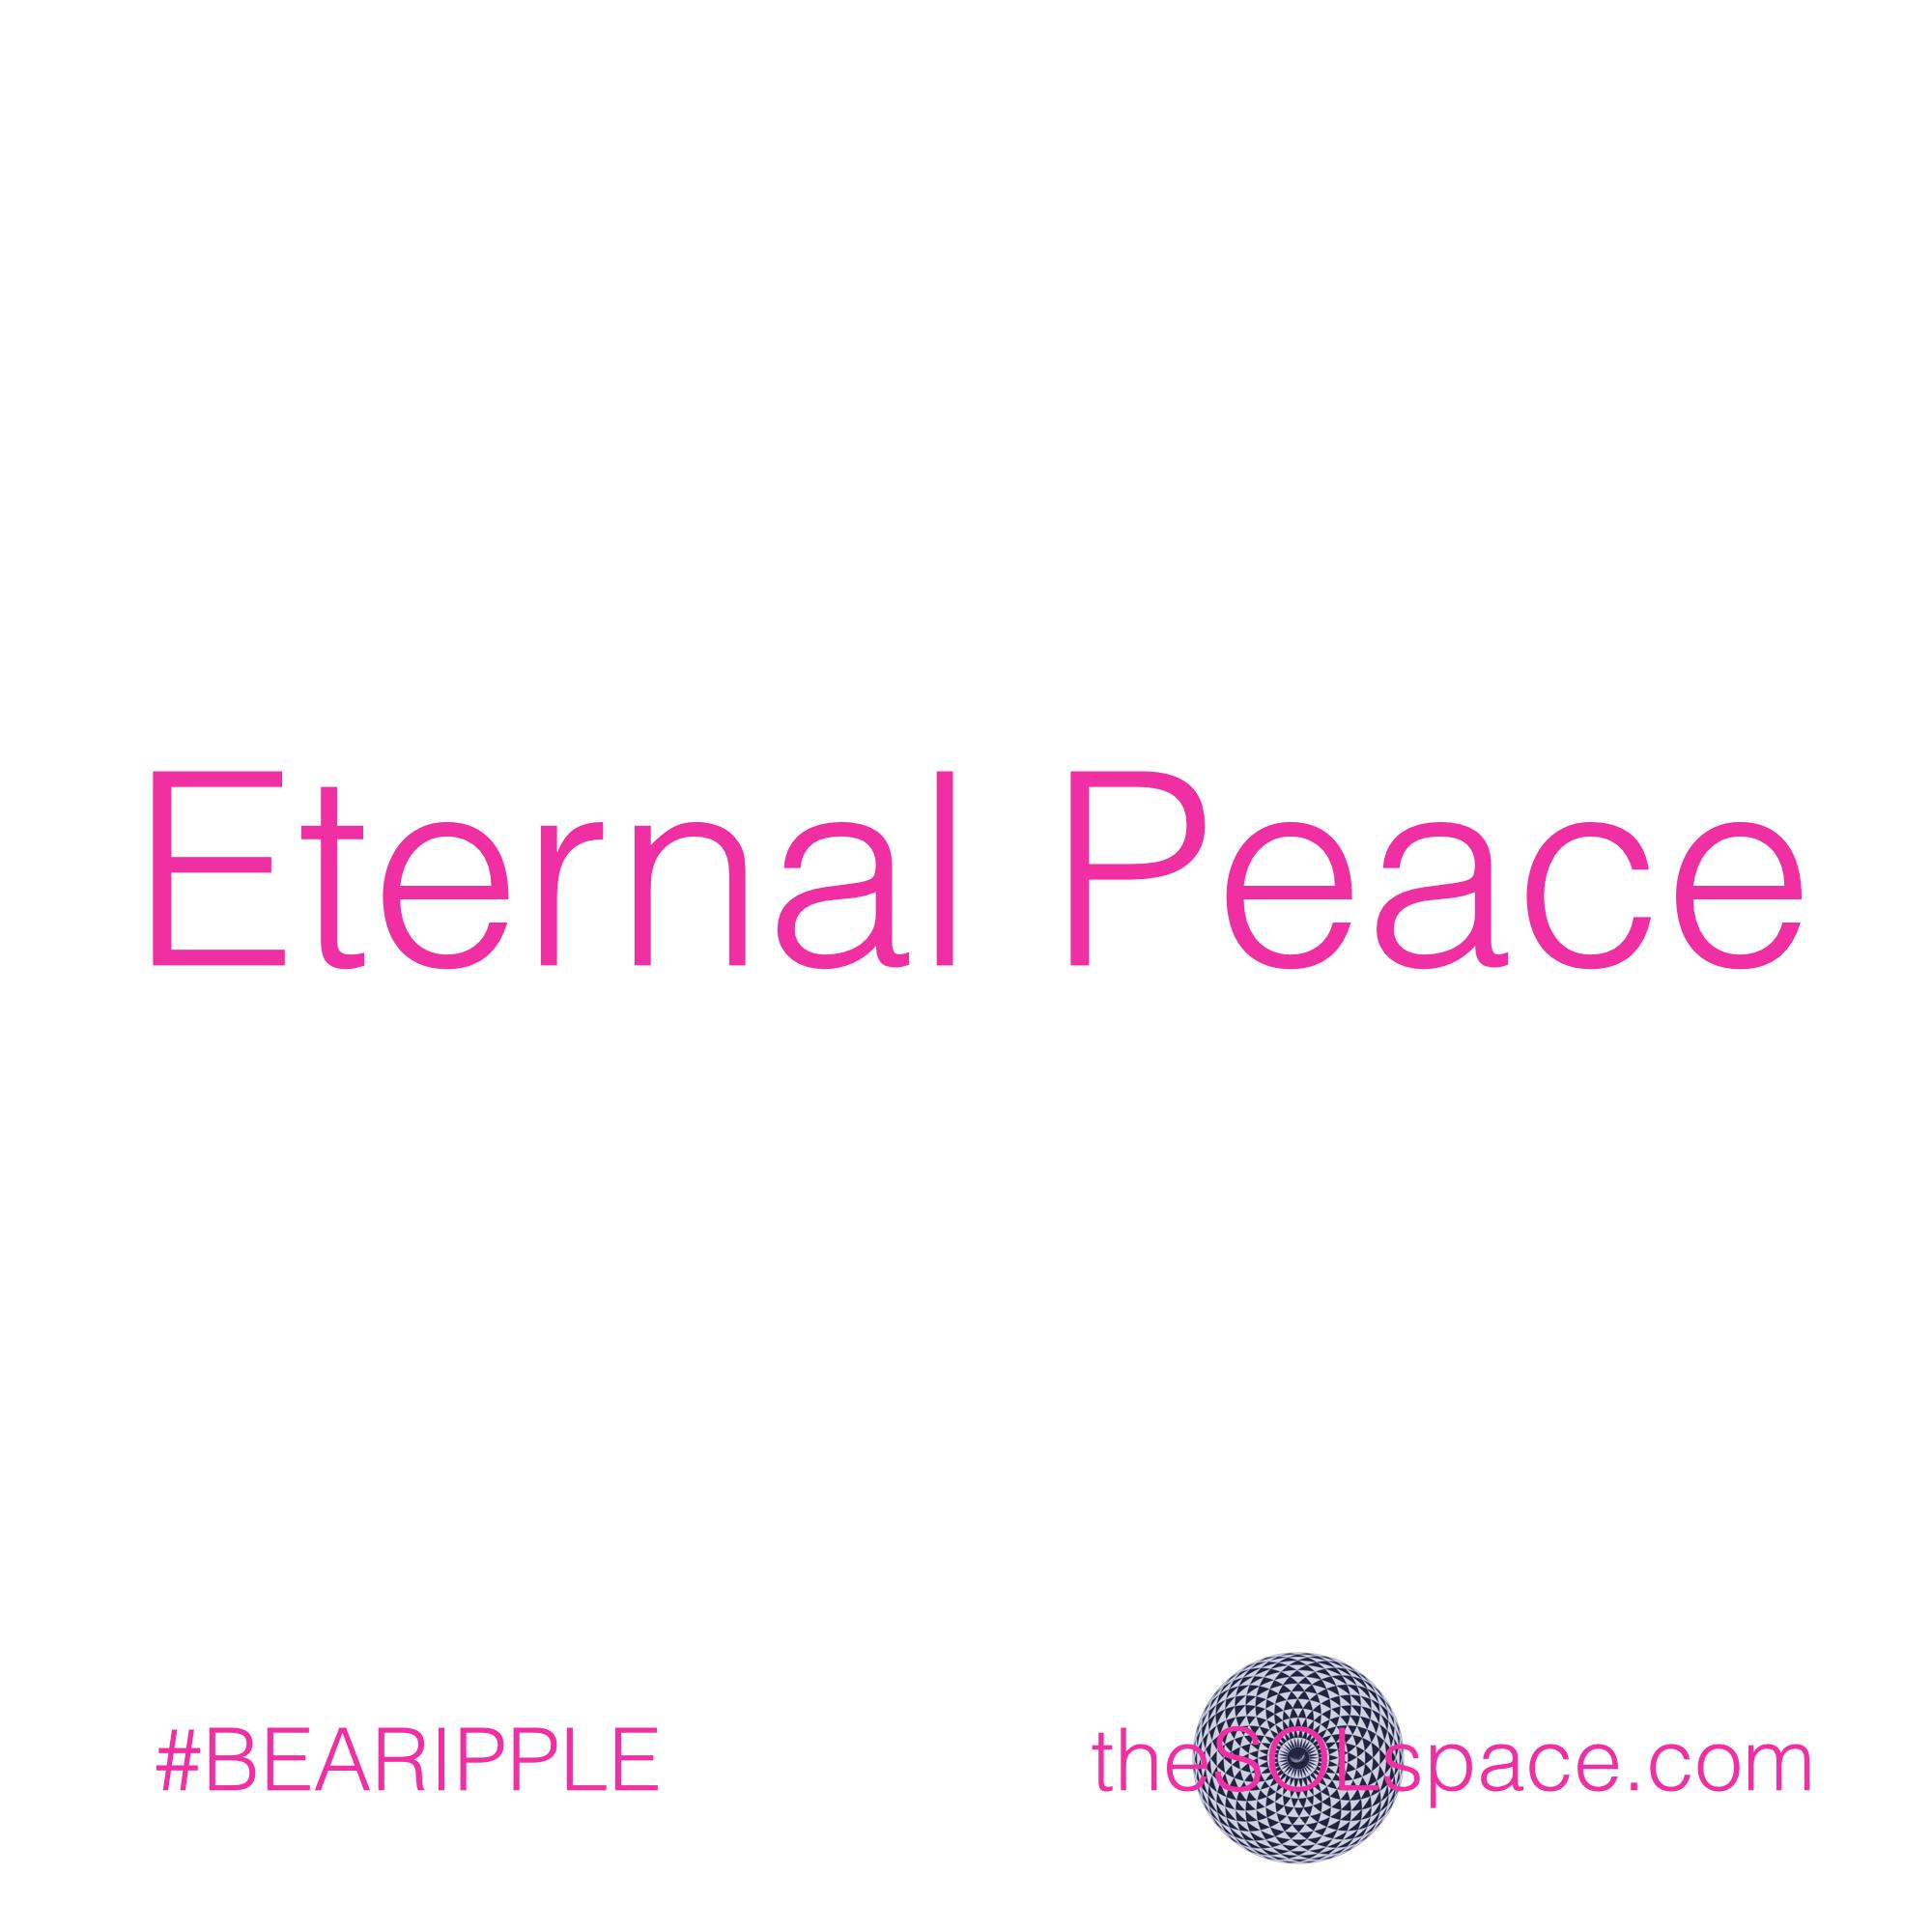 #BeARipple..Eternal Peace @theSOLspace